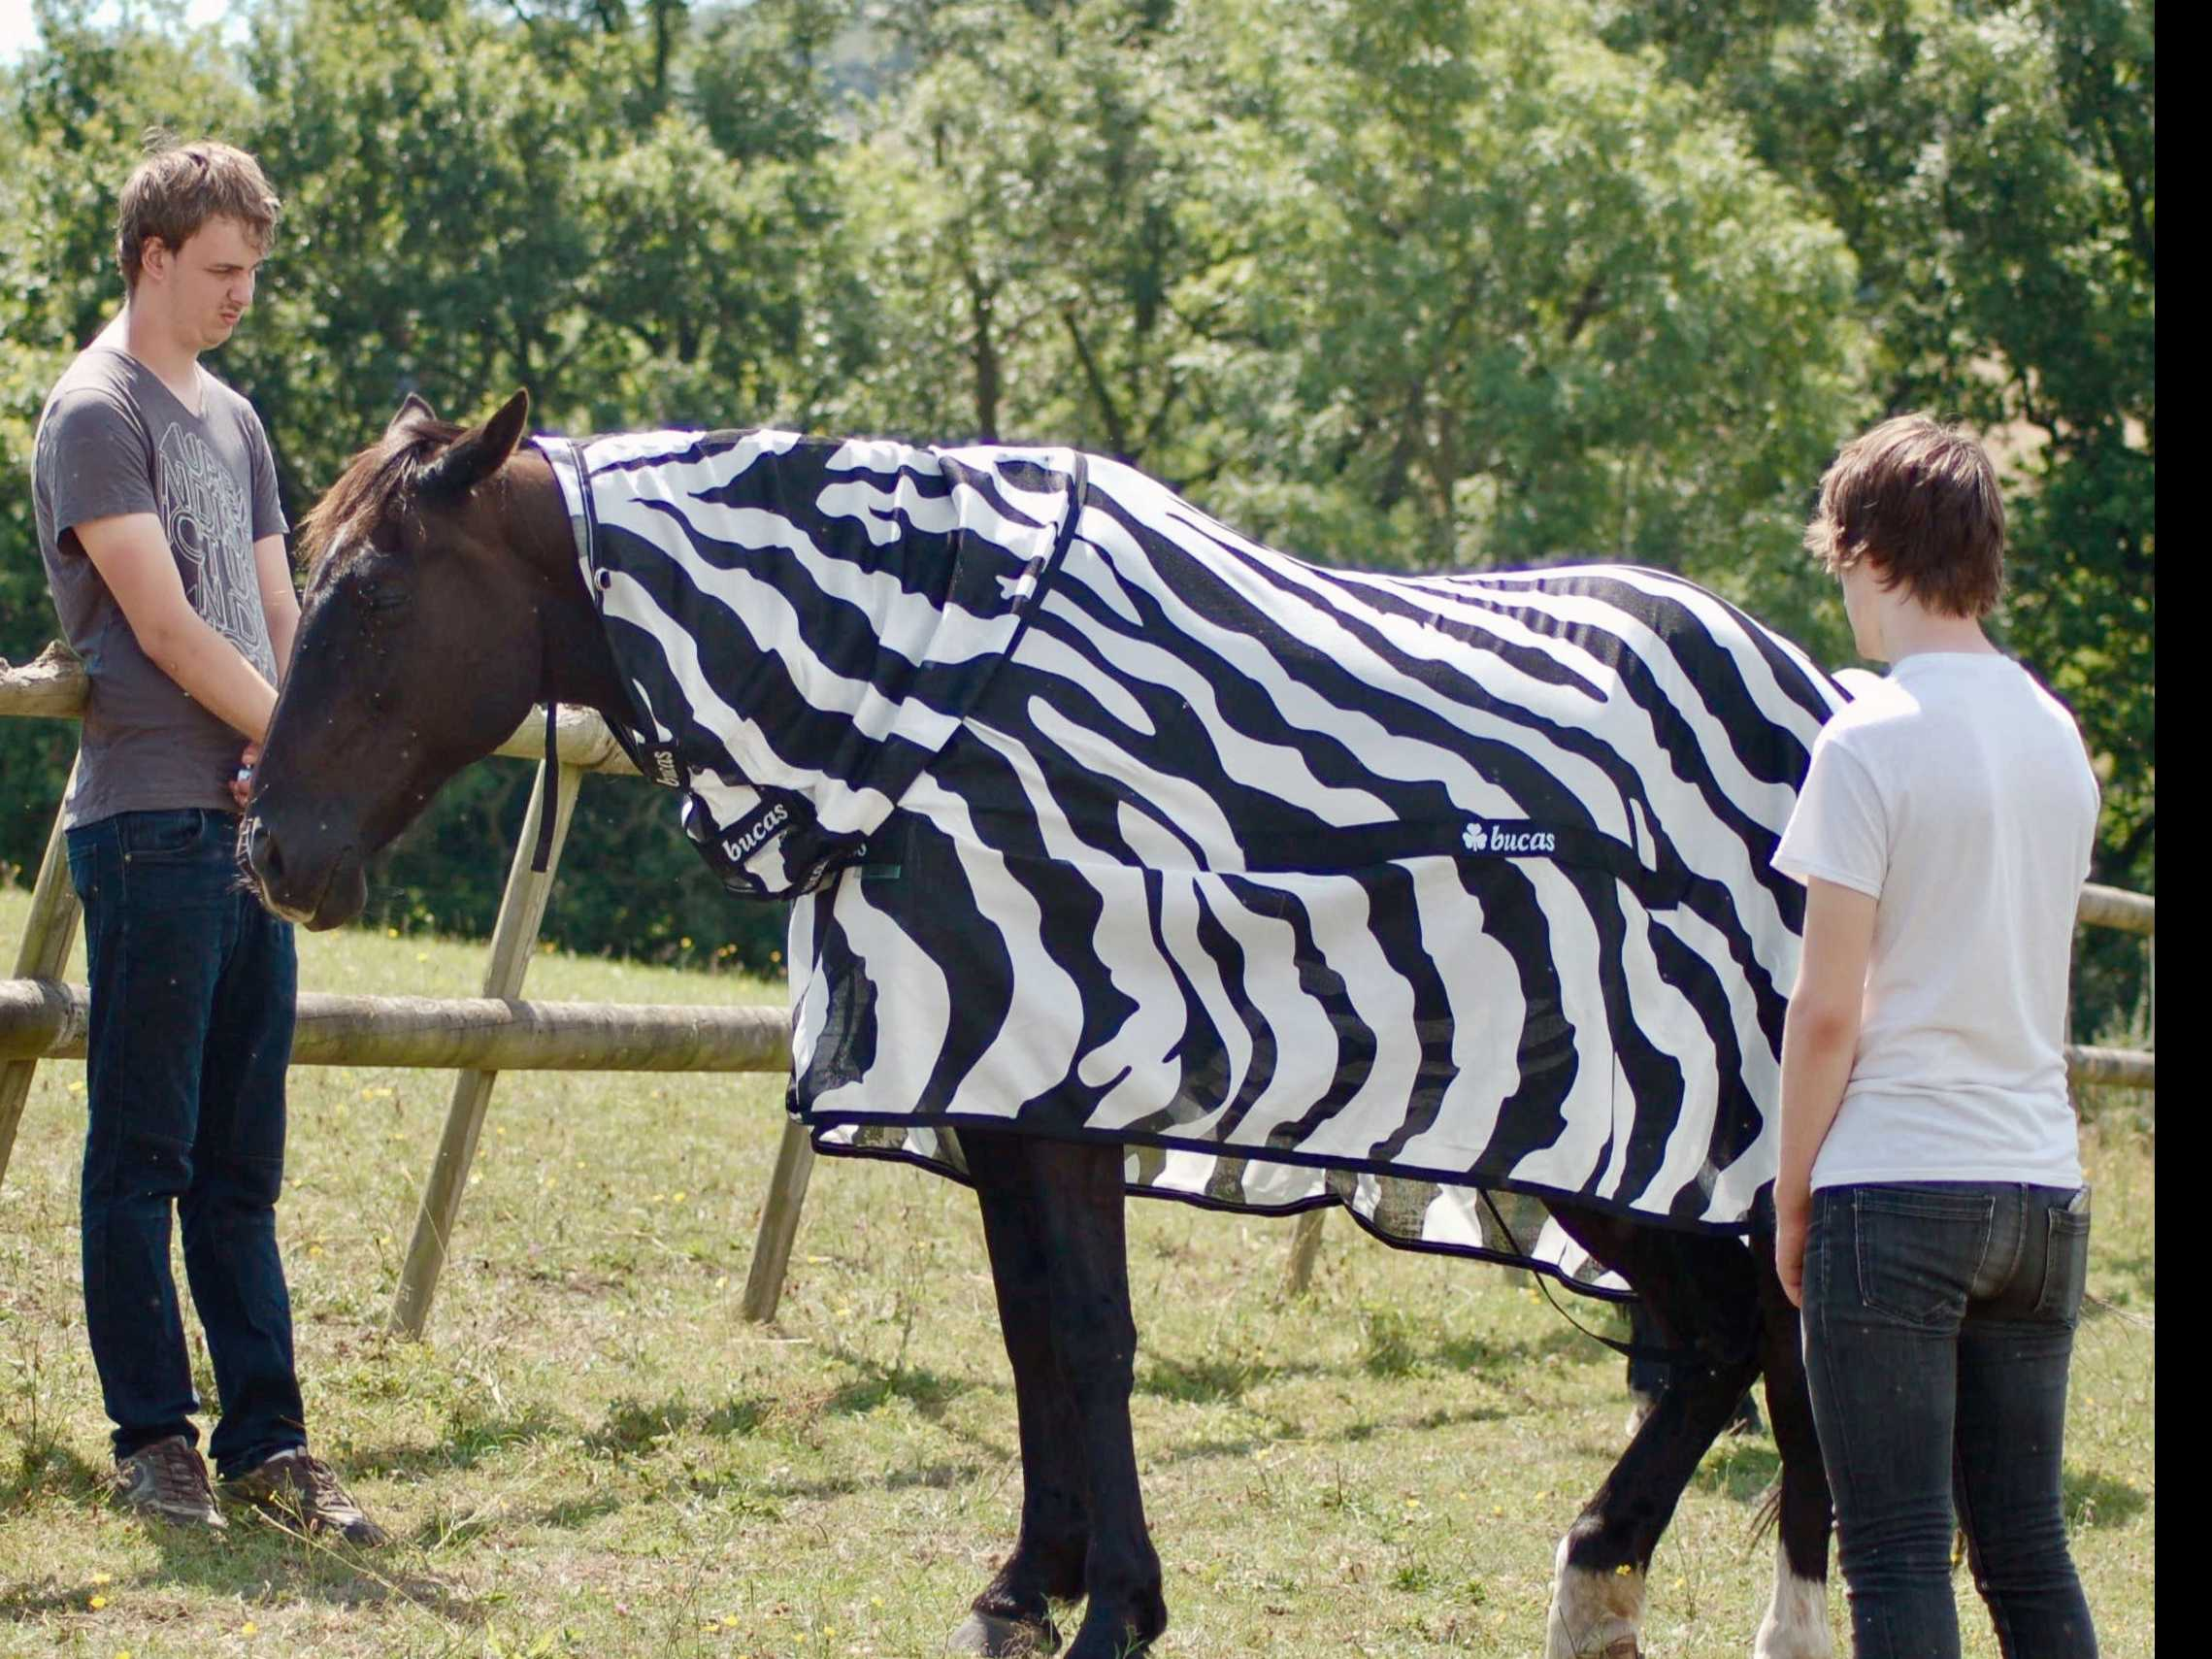 Why Do Zebras Have Stripes? Perhaps to Dazzle Away Flies